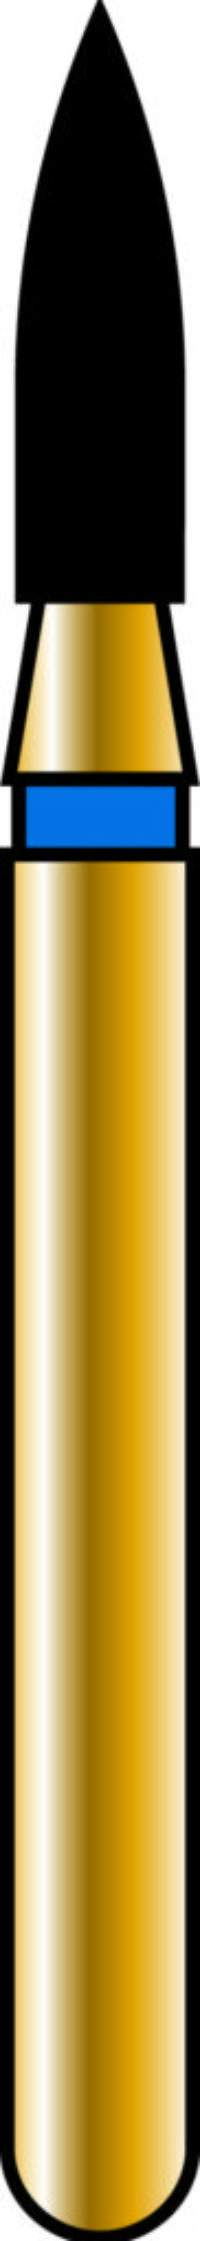 Flame 18-7mm Gold Diamond Bur - Coarse Grit